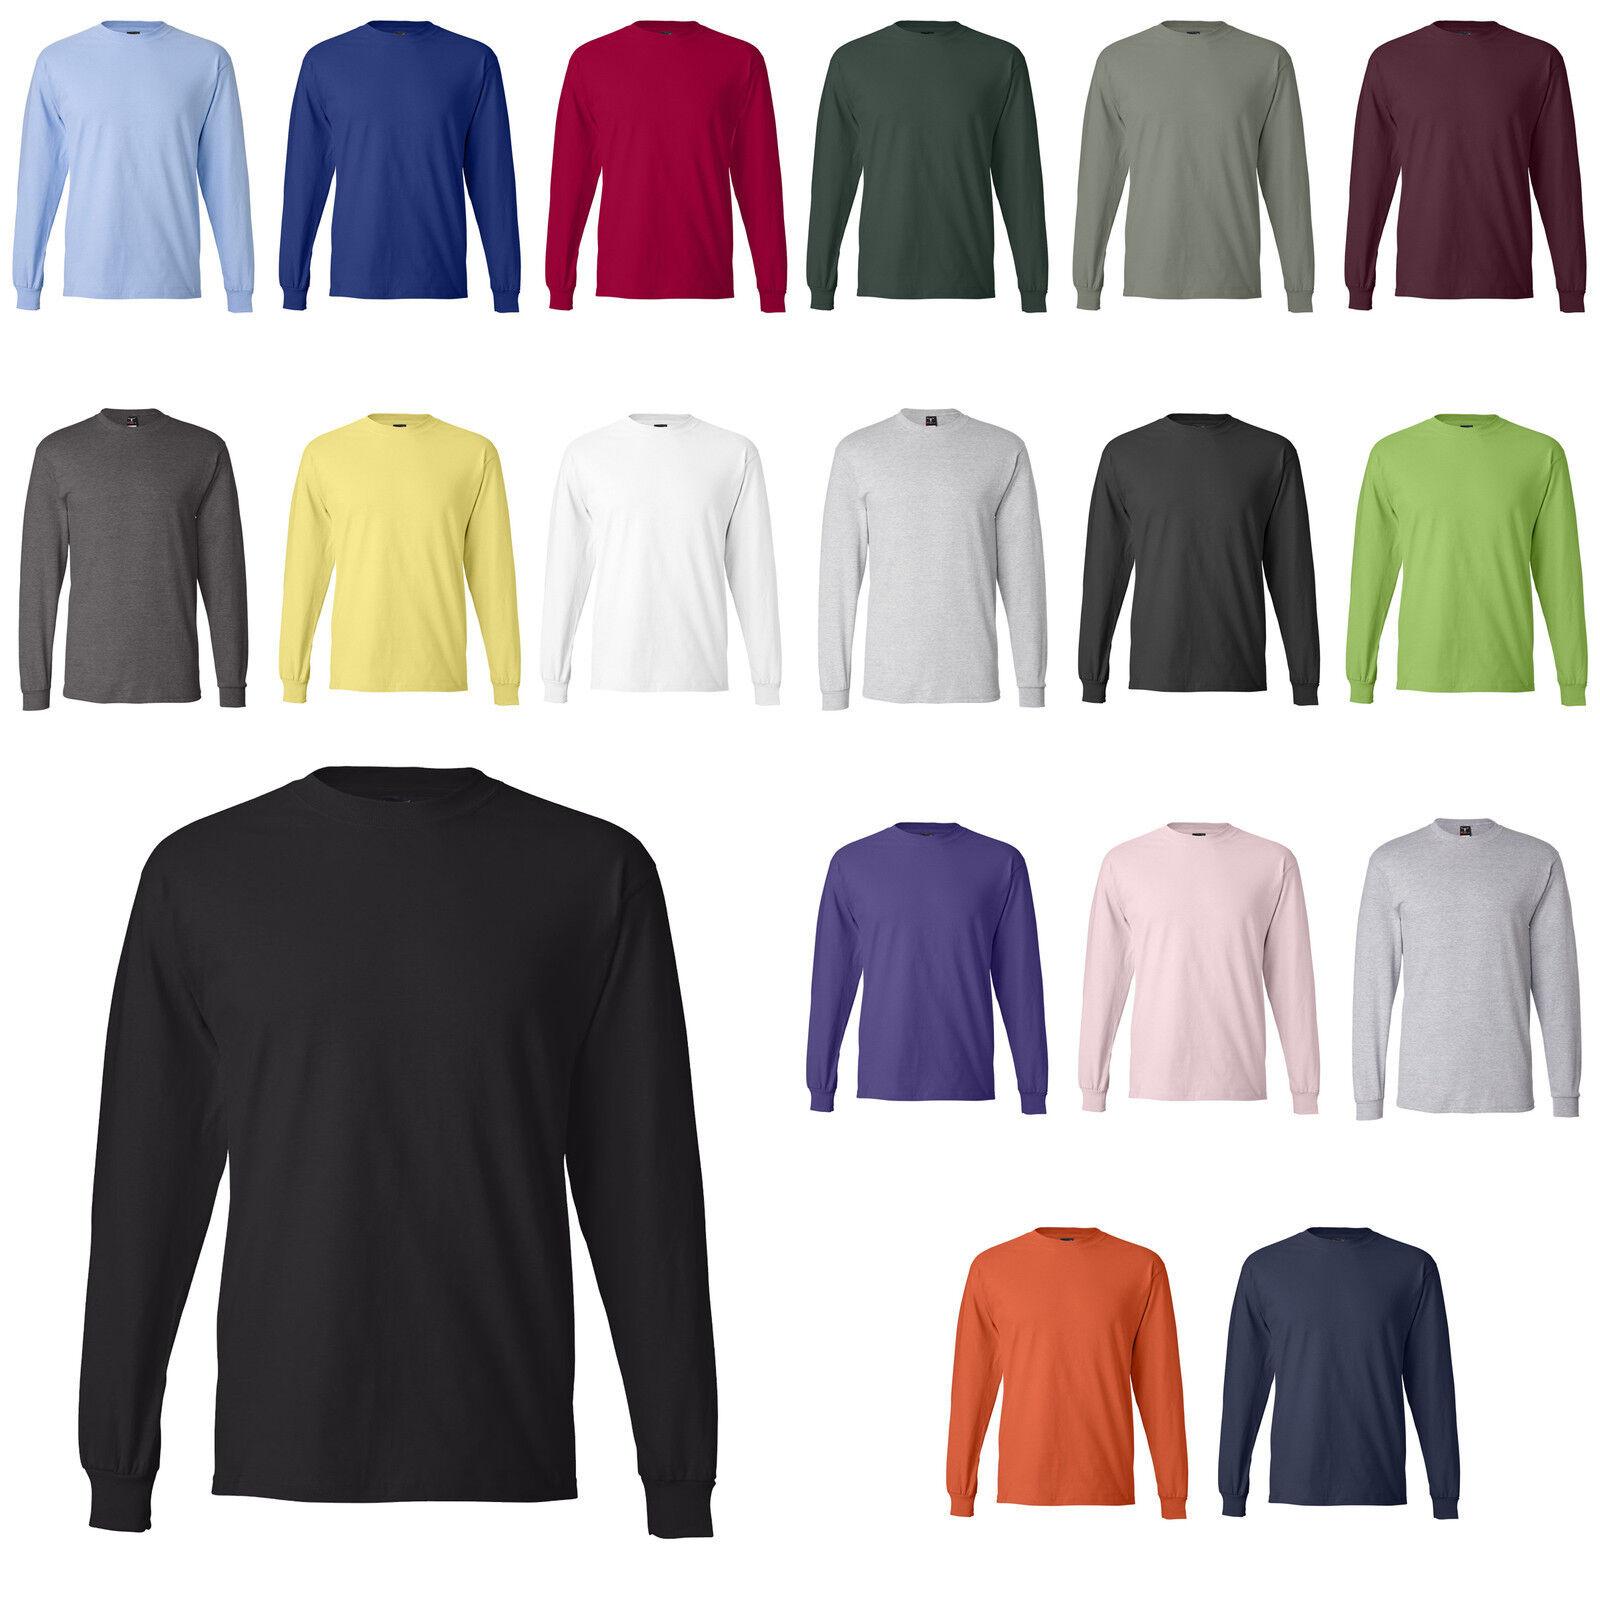 Hanes NEU 100% Baumwolle Langarm Beefy-T T-Shirt 5186 Herren S-3XL T-Shirt 25 FARBEN